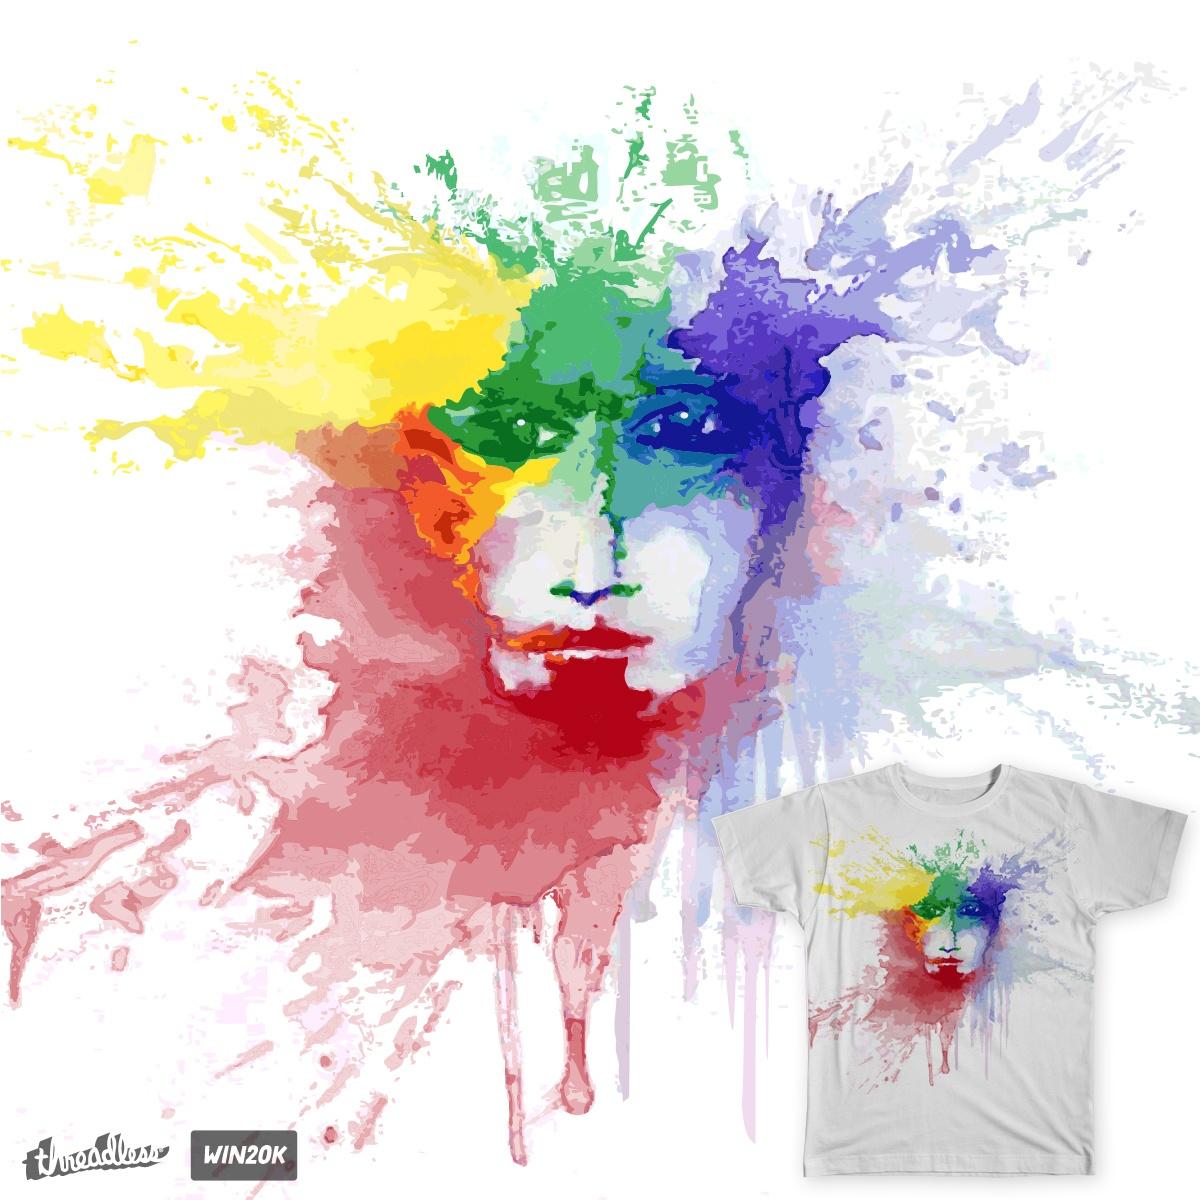 Mr. Technicolor by vylan on Threadless